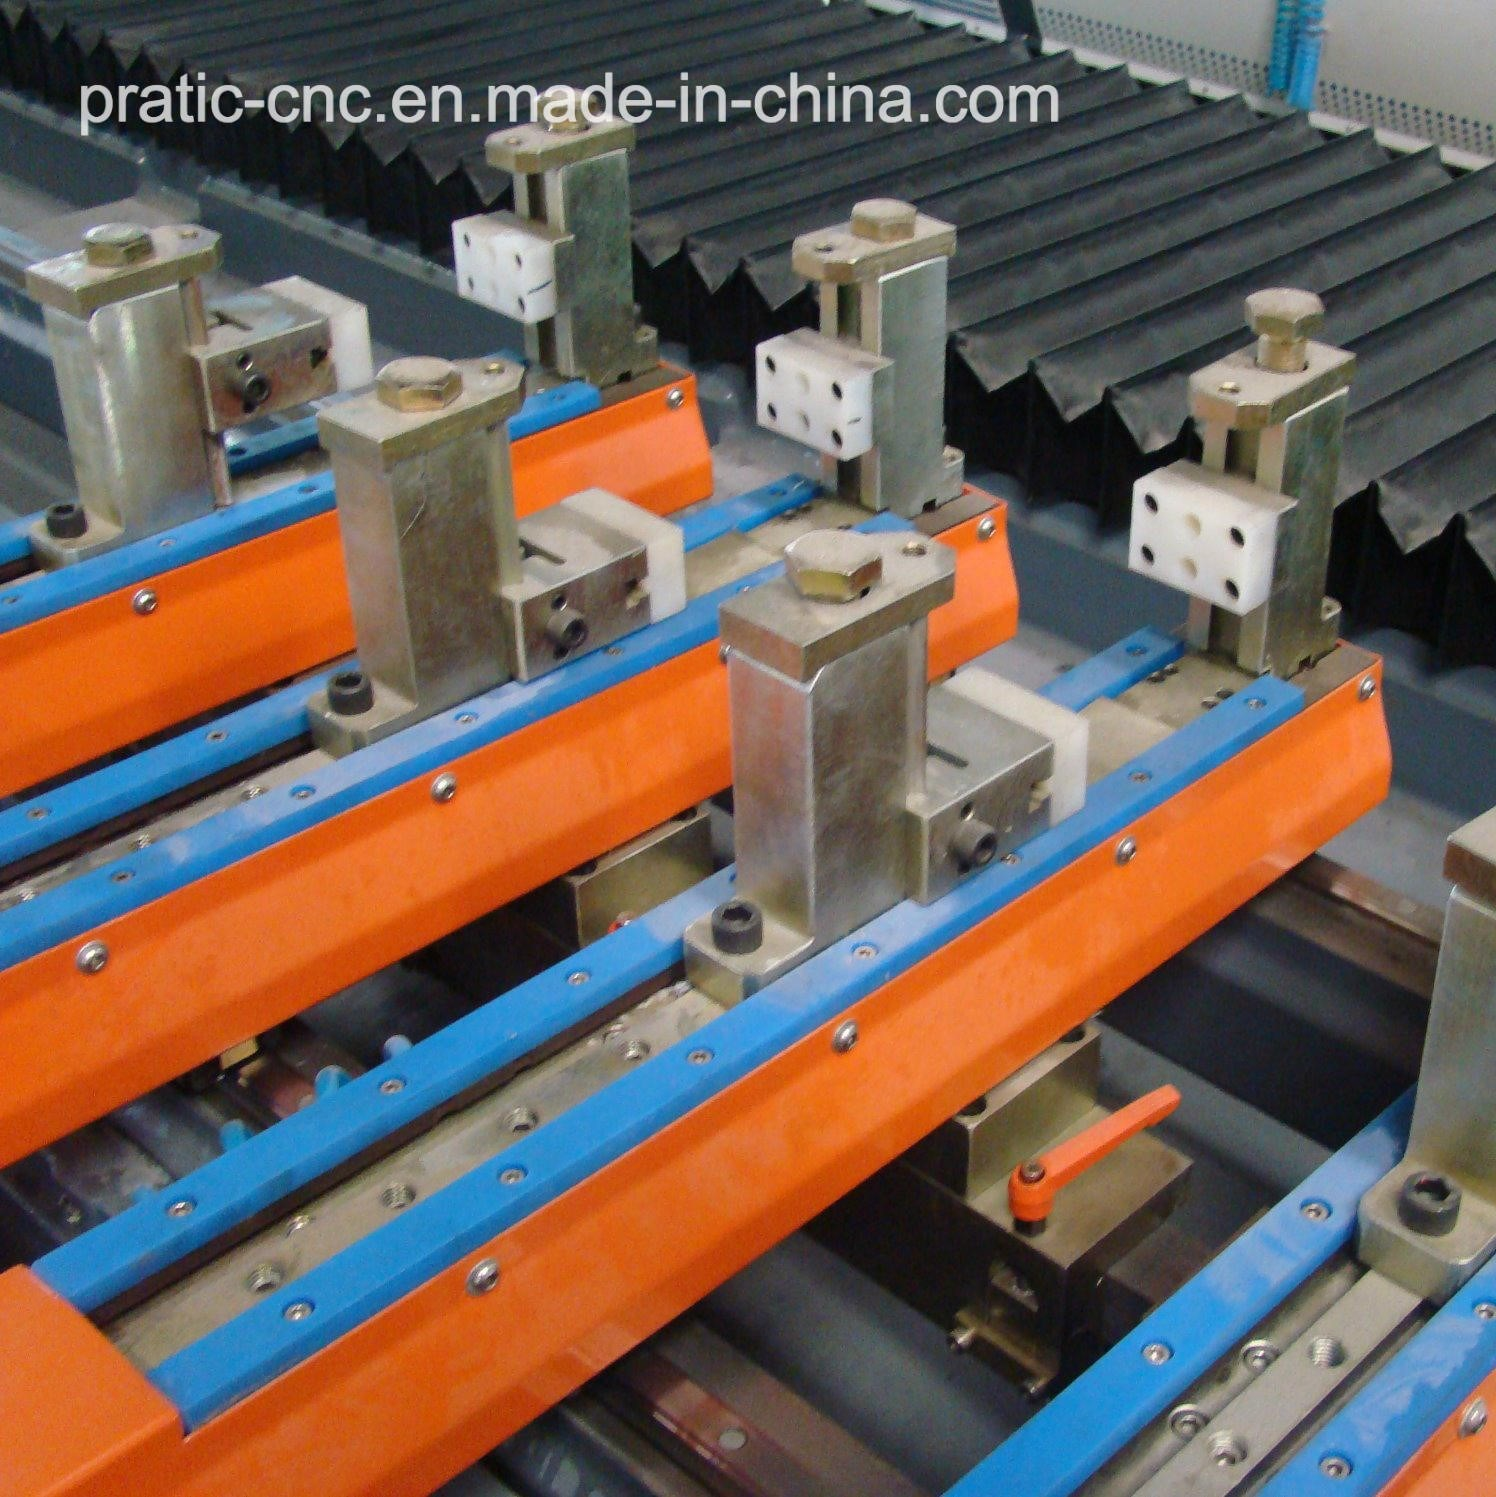 CNC Welding Lathe Milling Drilling Machine -Pratic Pza-4500s